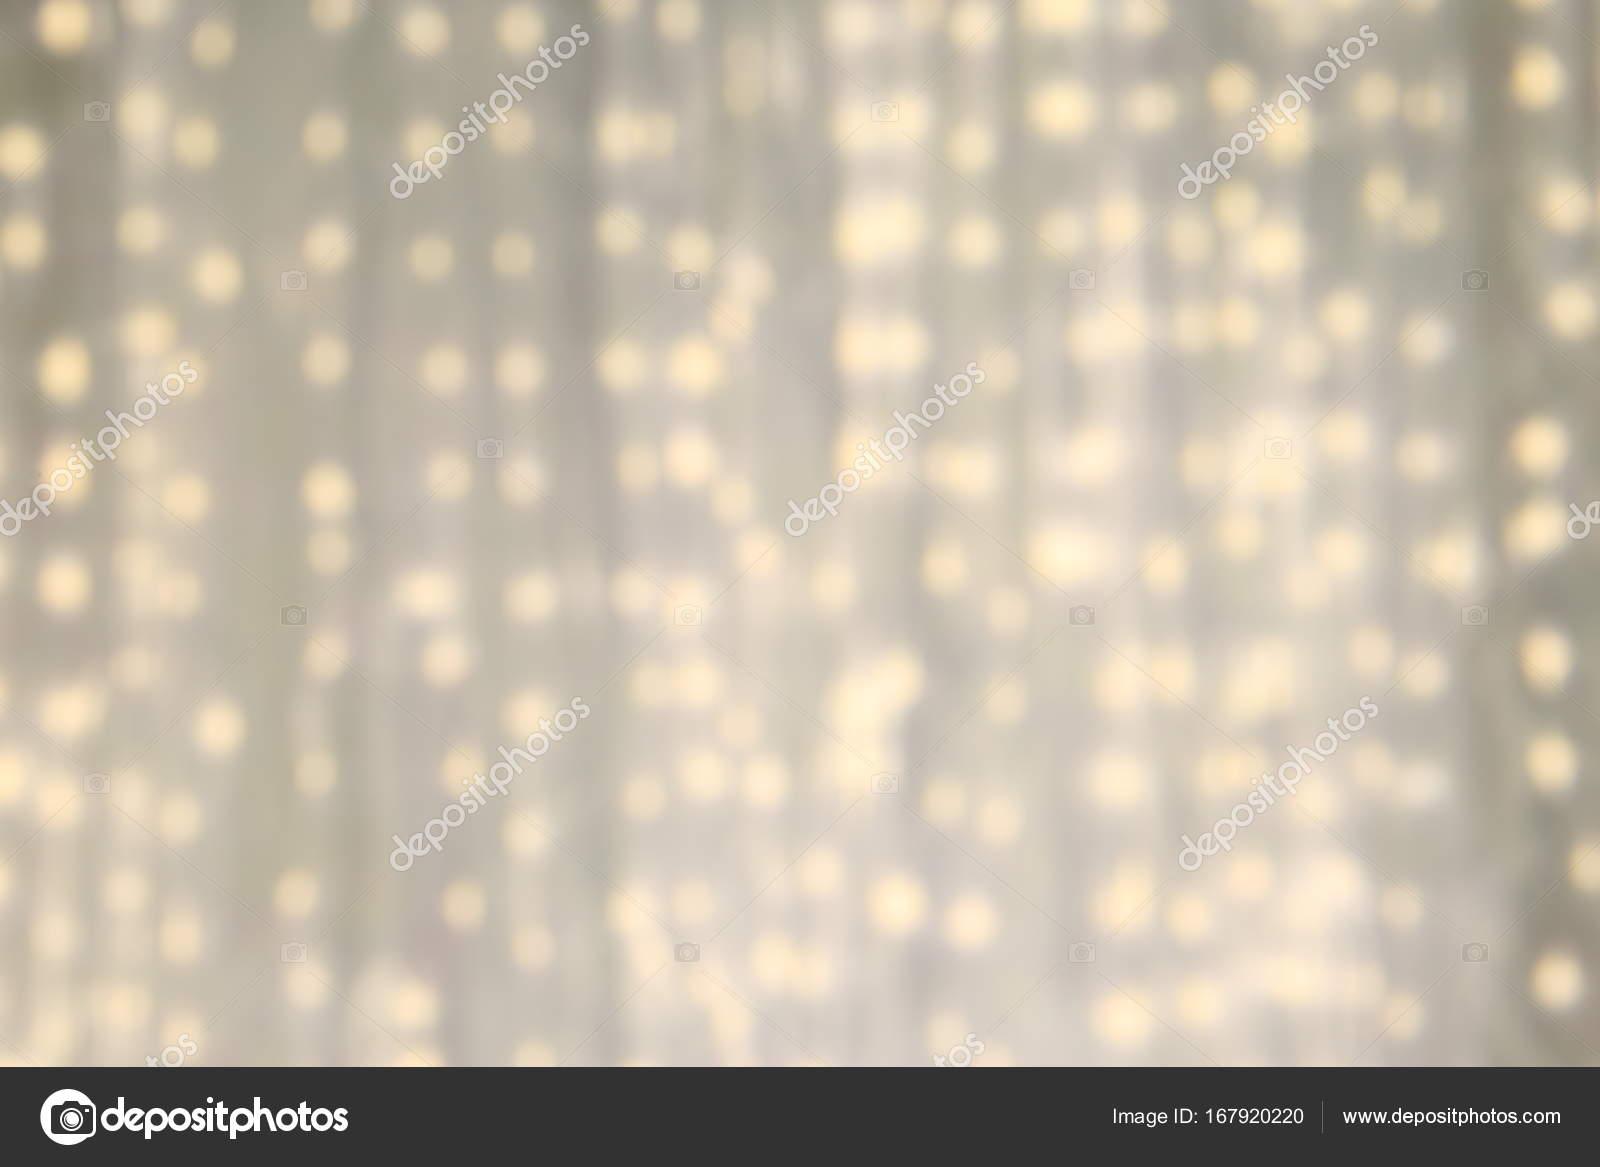 Led Light On White Cloth Curtain Backdrop Defocus White